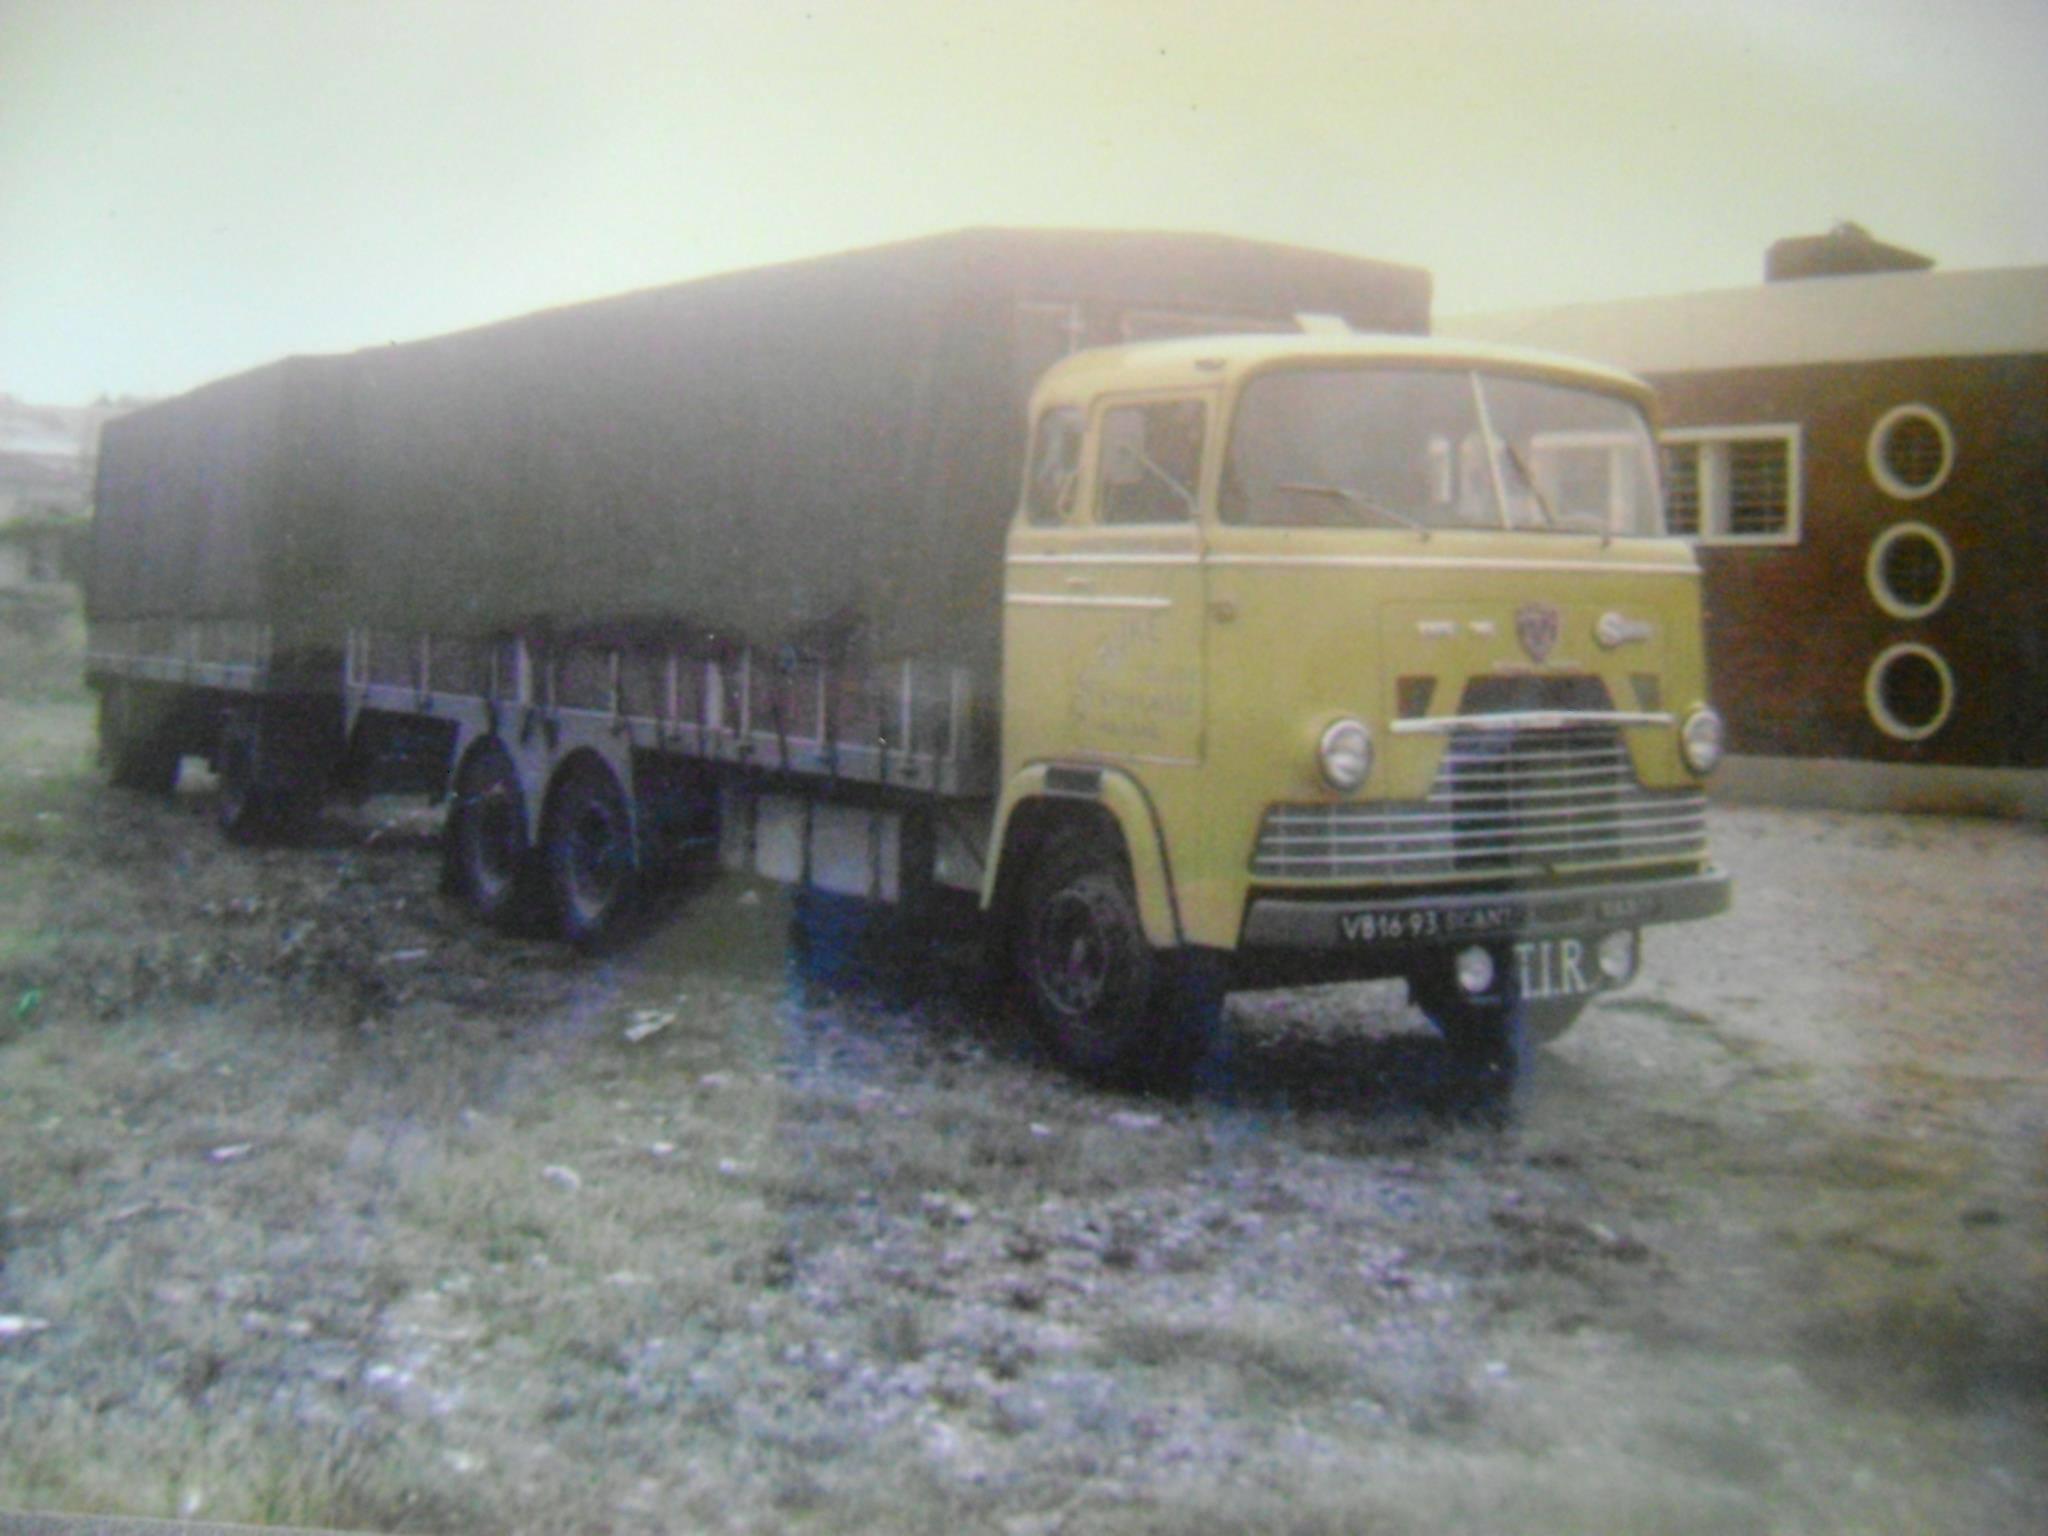 0-Scania-Vabis-LV